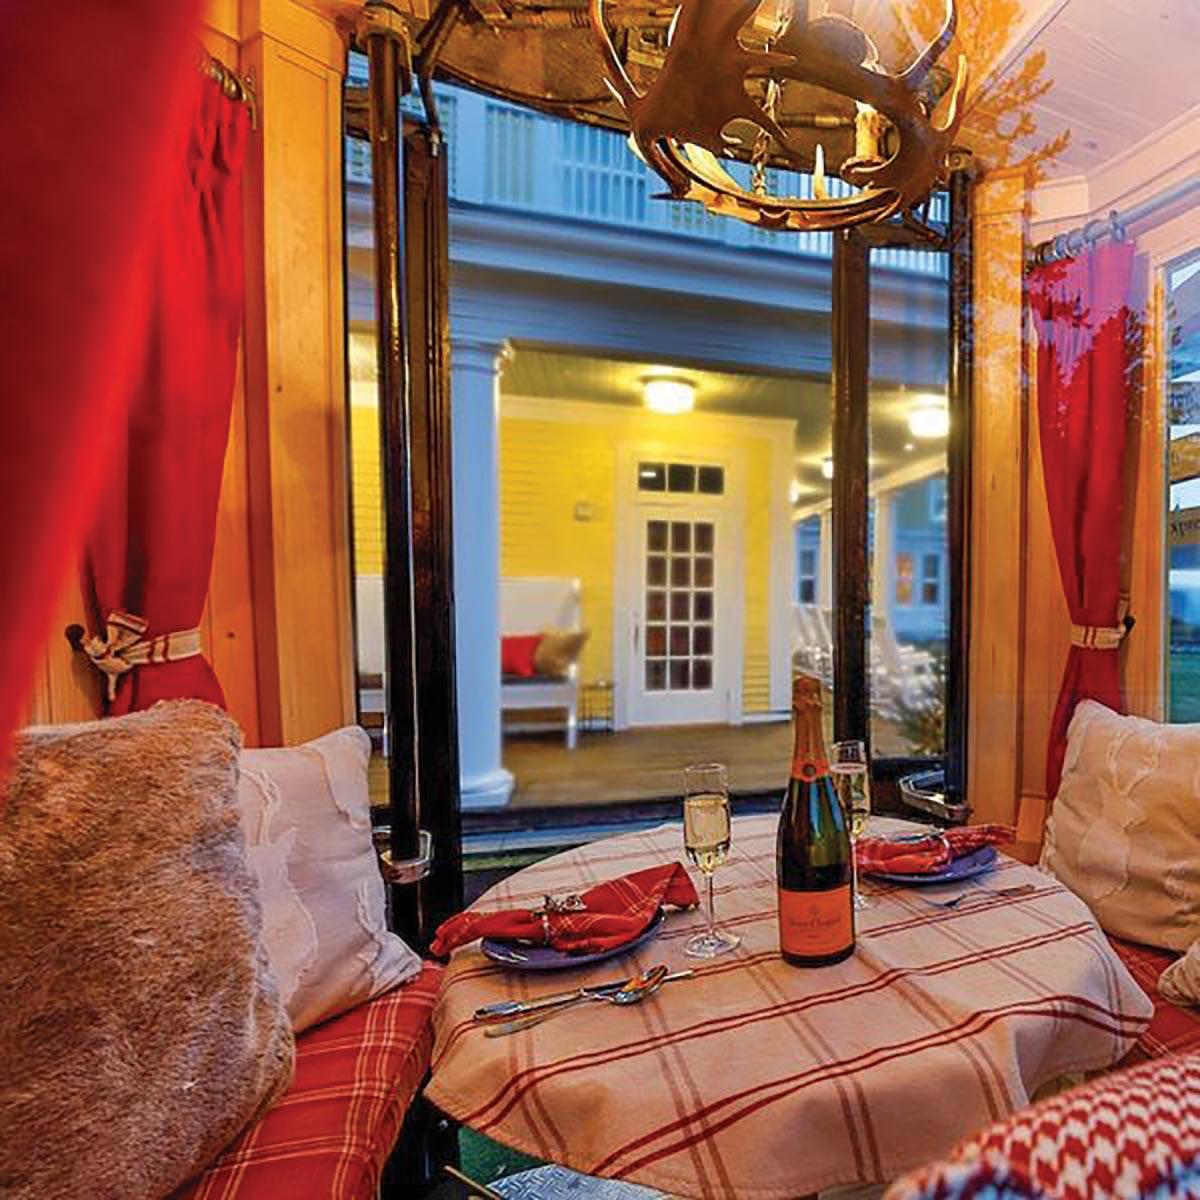 Veuve Clicquot Fondue Village Begins Annual Run